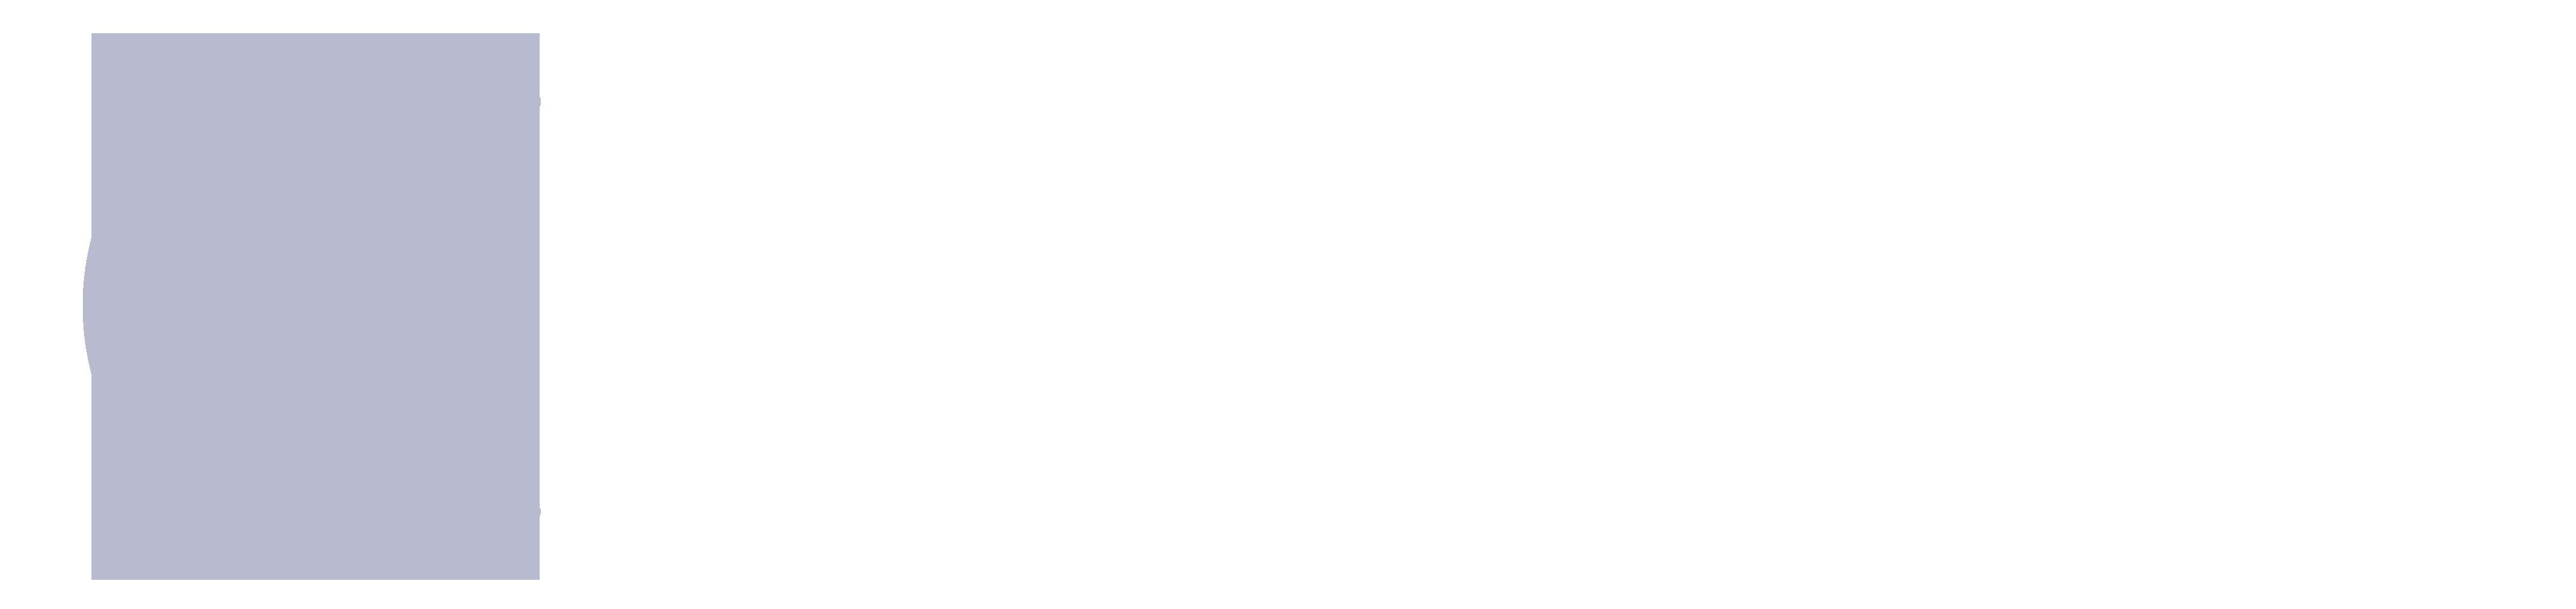 Denis Hoeger Caballero Consulting Logo